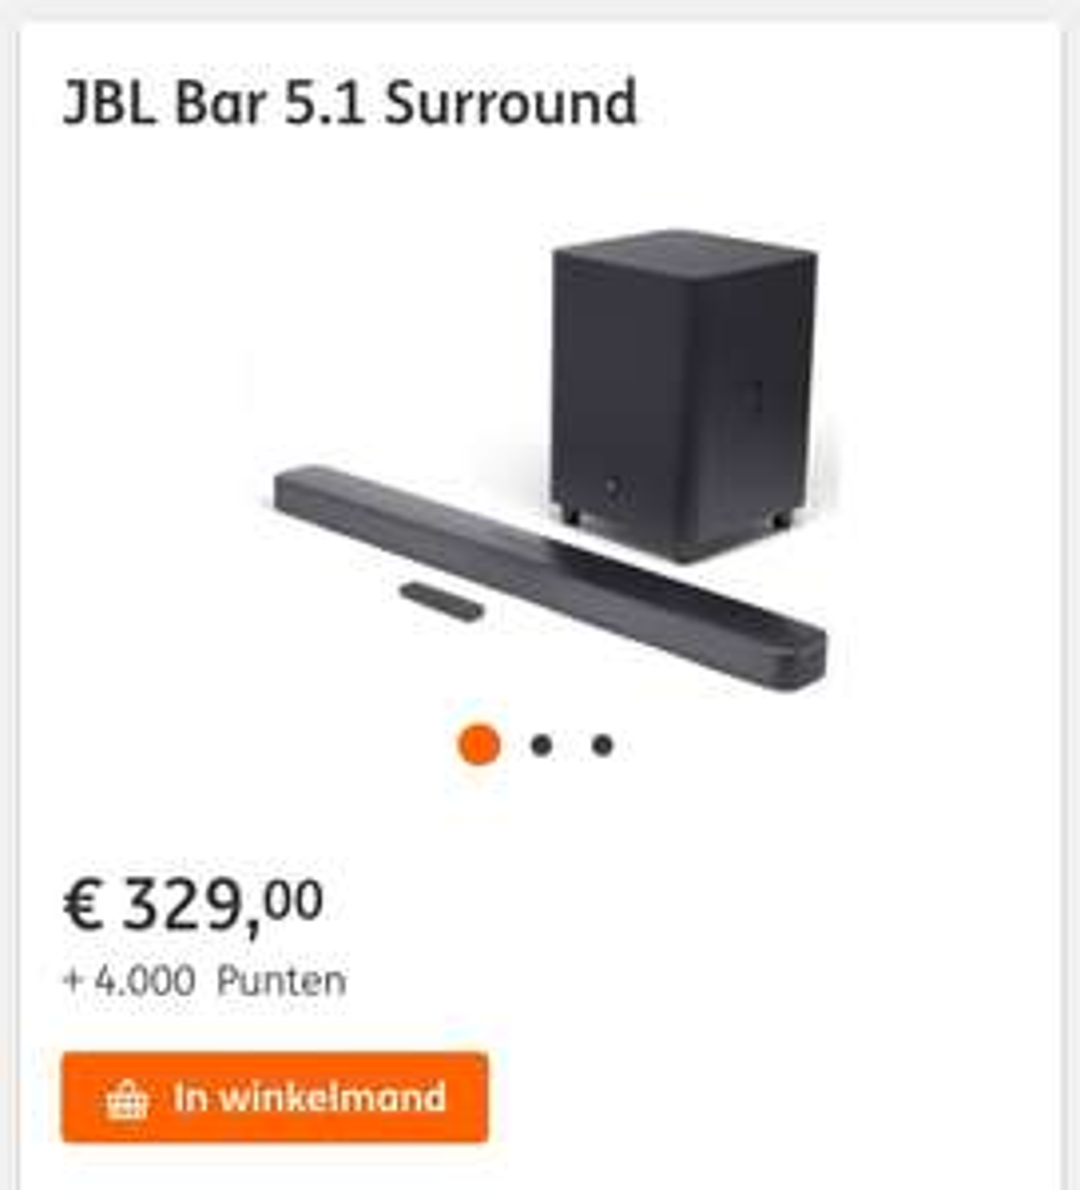 JBL 5.1 Bar Surround (weer op voorraad, icm ING punten)